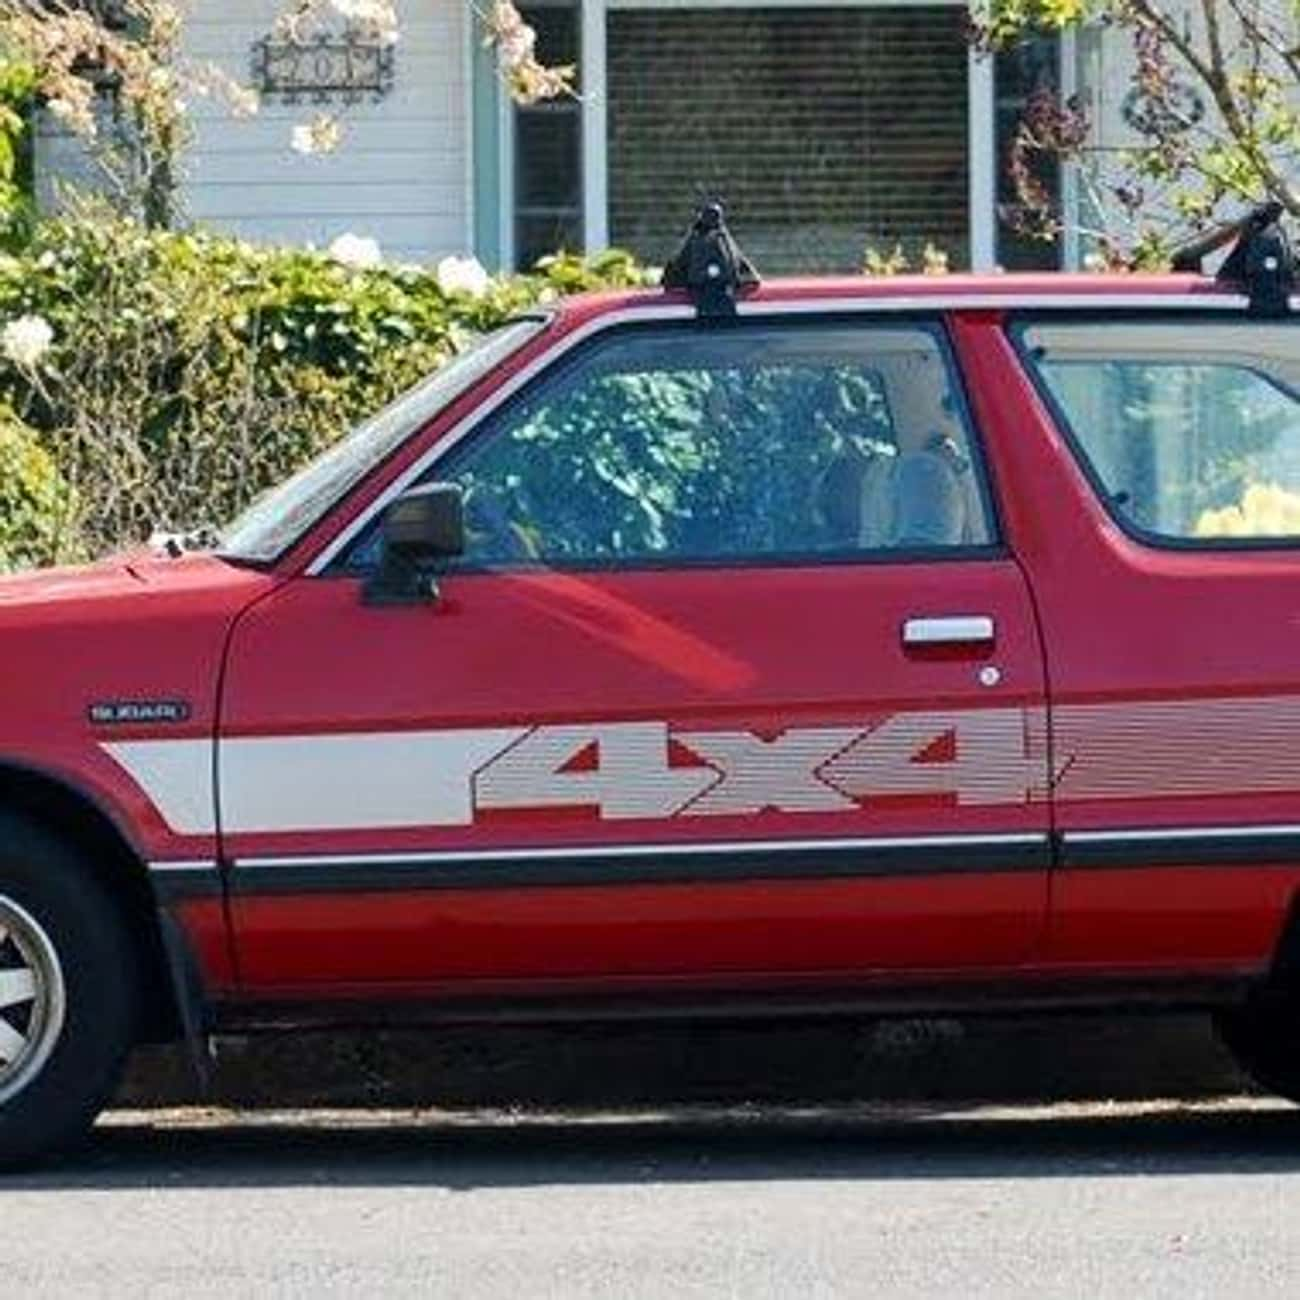 1985 Subaru Hatchback Hatchbac is listed (or ranked) 3 on the list List of 1985 Subarus